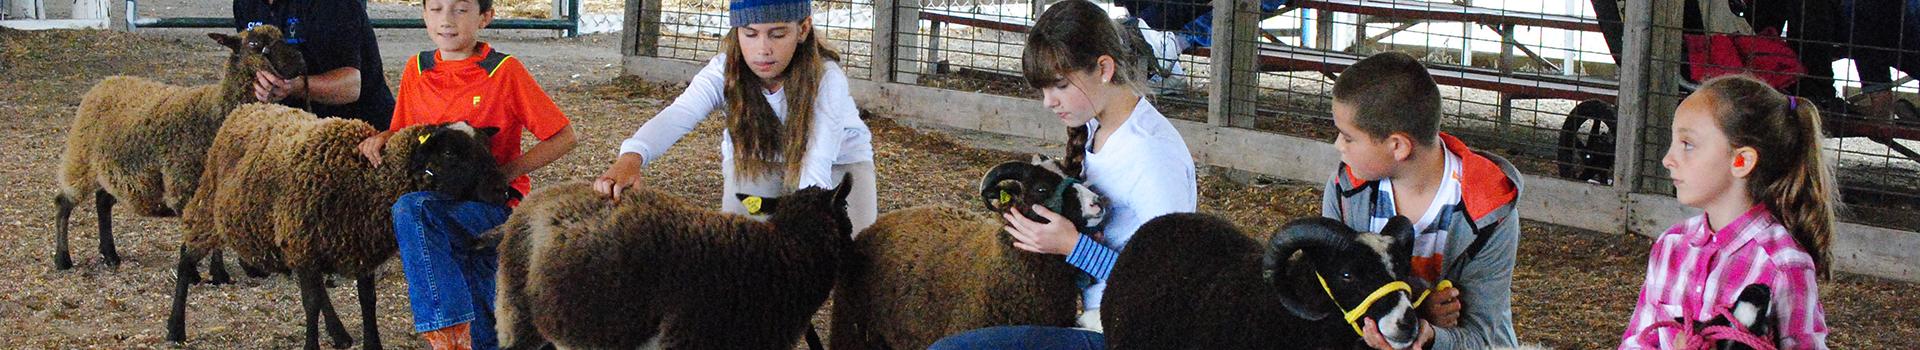 Wisconsin Sheep & Wool Festival | Sheep Shows - MSSBA Show